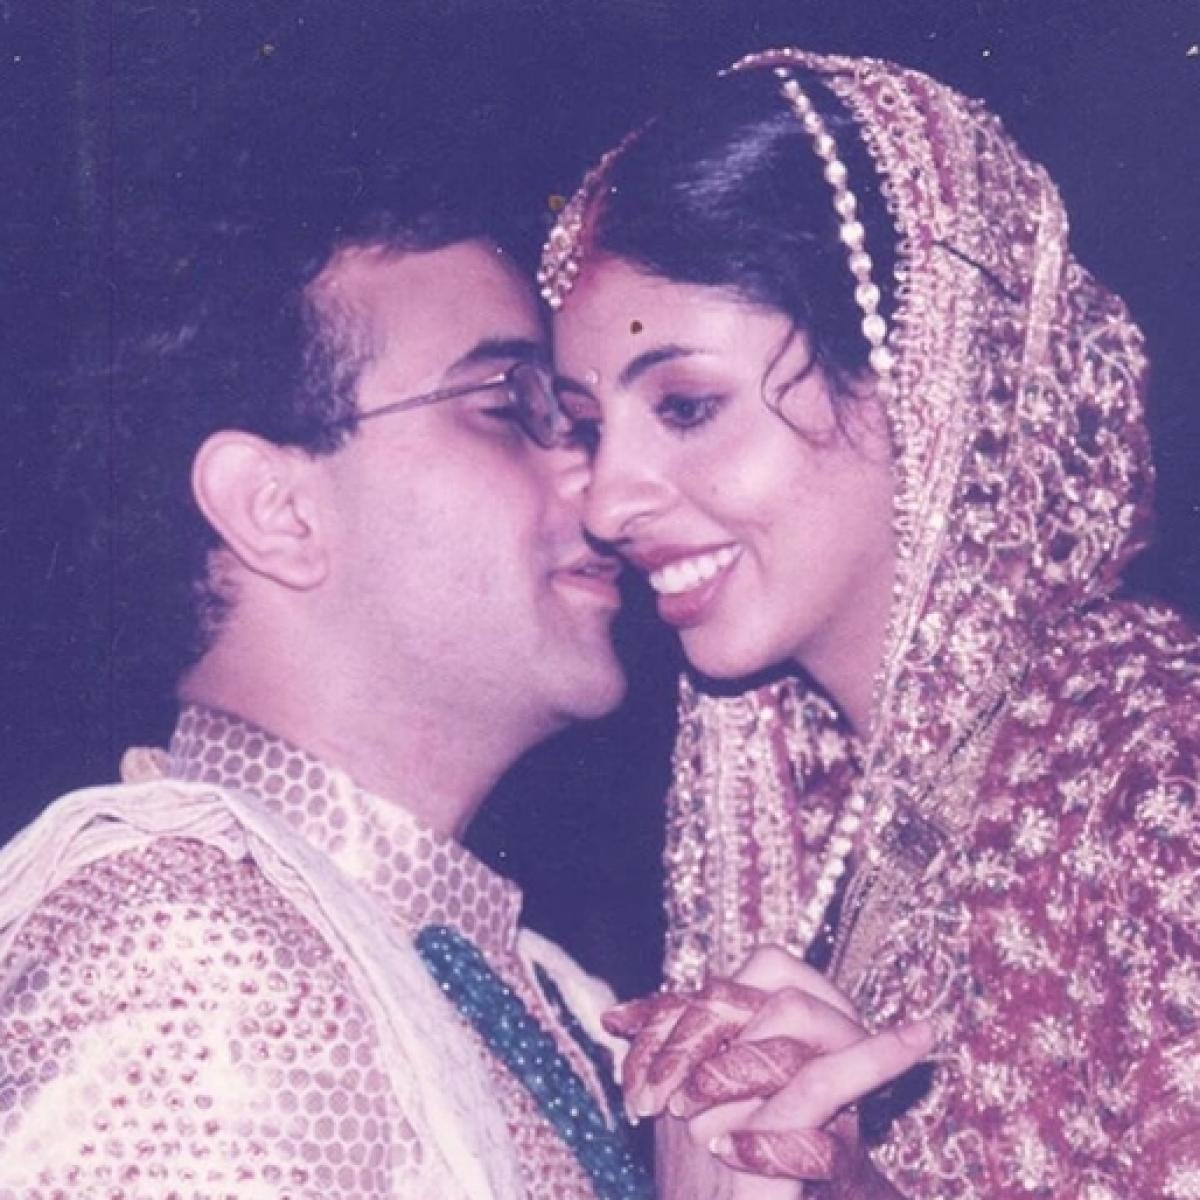 Has Shweta Bachchan parted ways with husband Nikhil Nanda?